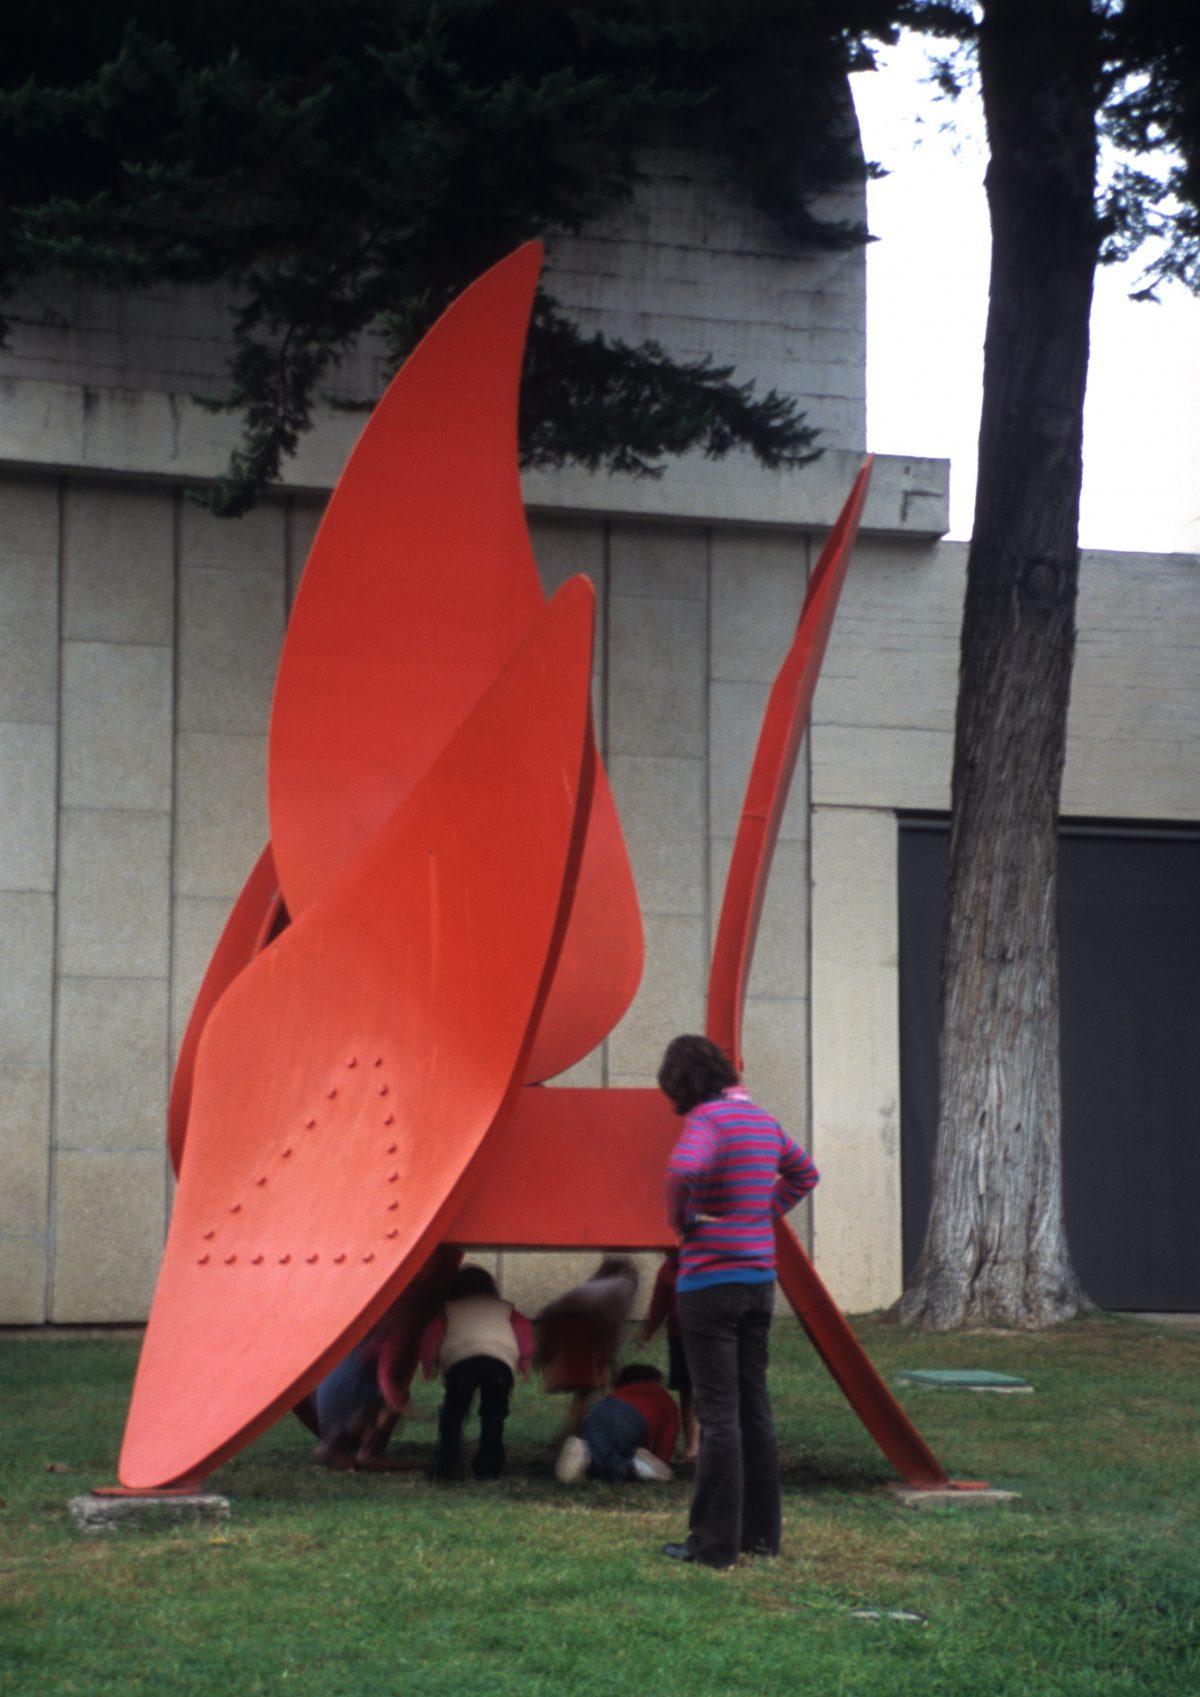 Miro Museum - Joan Miró Foundation, female, art, kid, game, sculpture